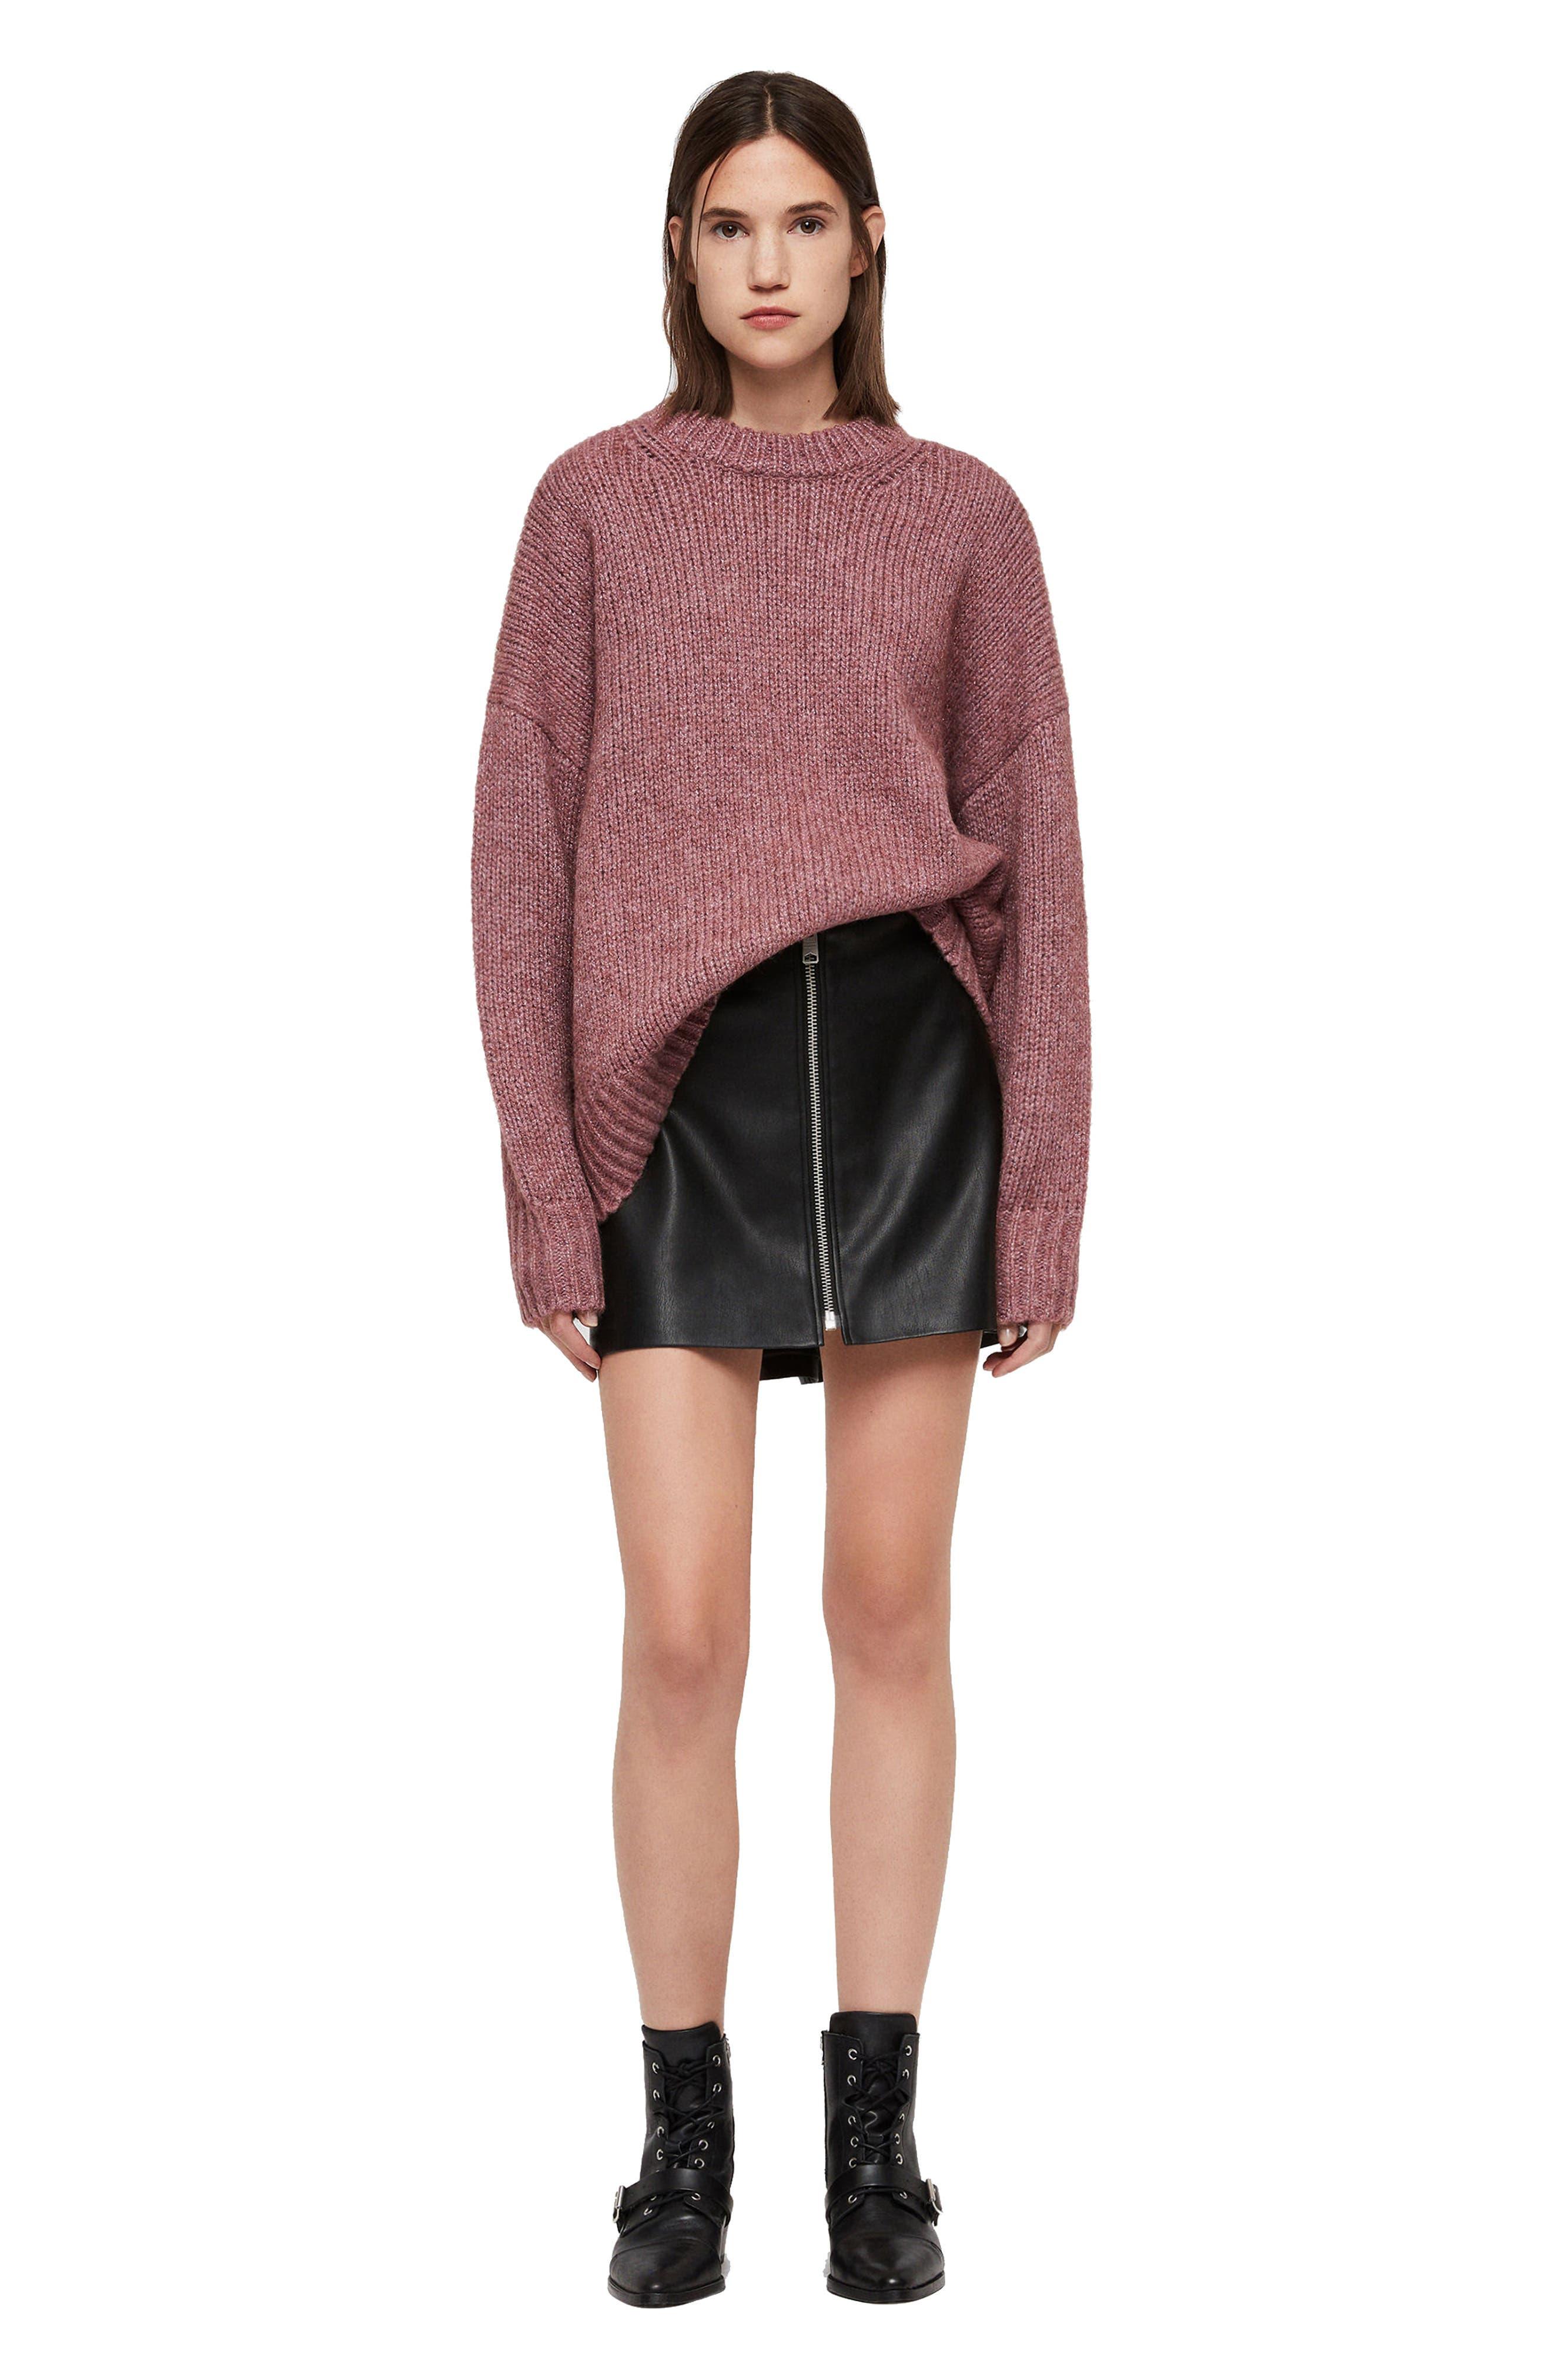 ALLSAINTS, Gemini Metallic Knit Sweater, Alternate thumbnail 6, color, 653